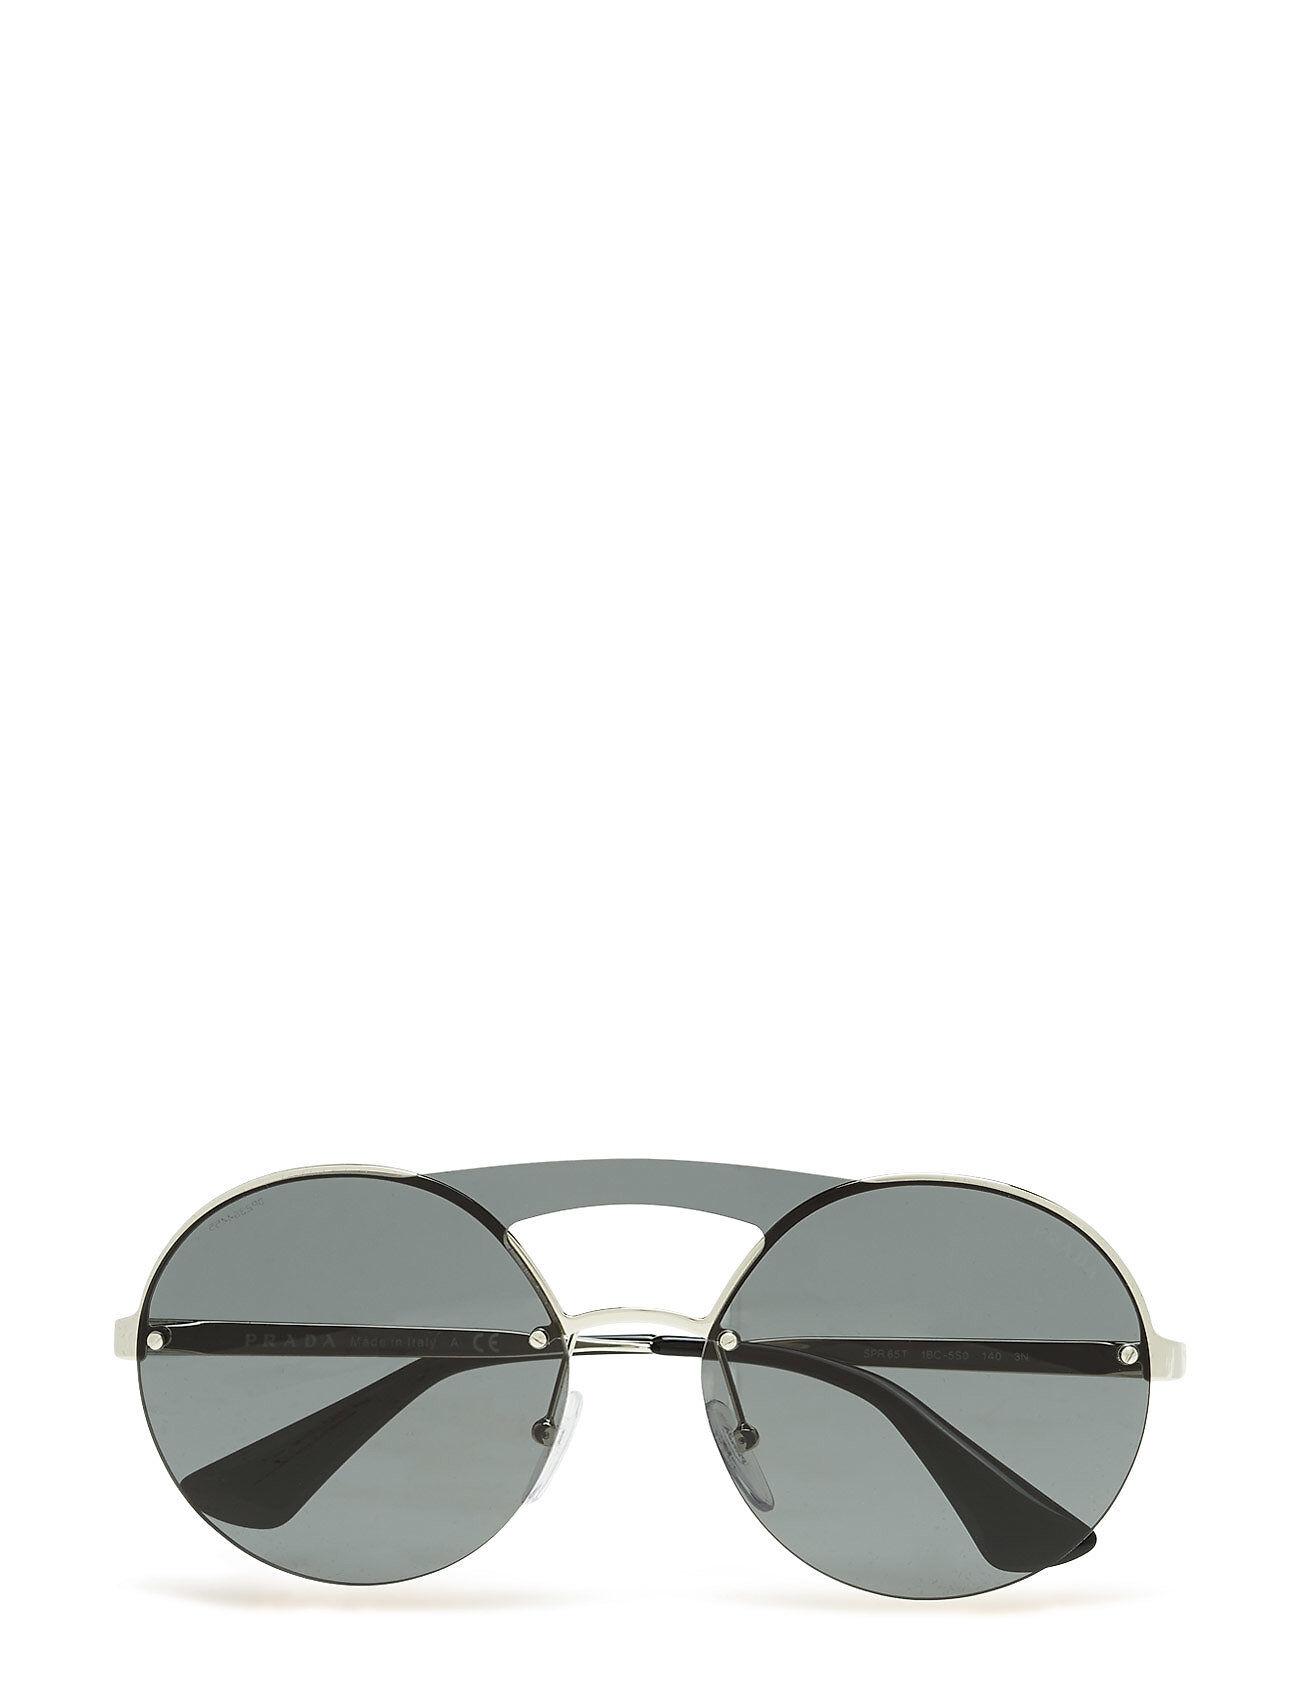 Image of Prada Sunglasses Not Defined Aurinkolasit Hopea Prada Sunglasses